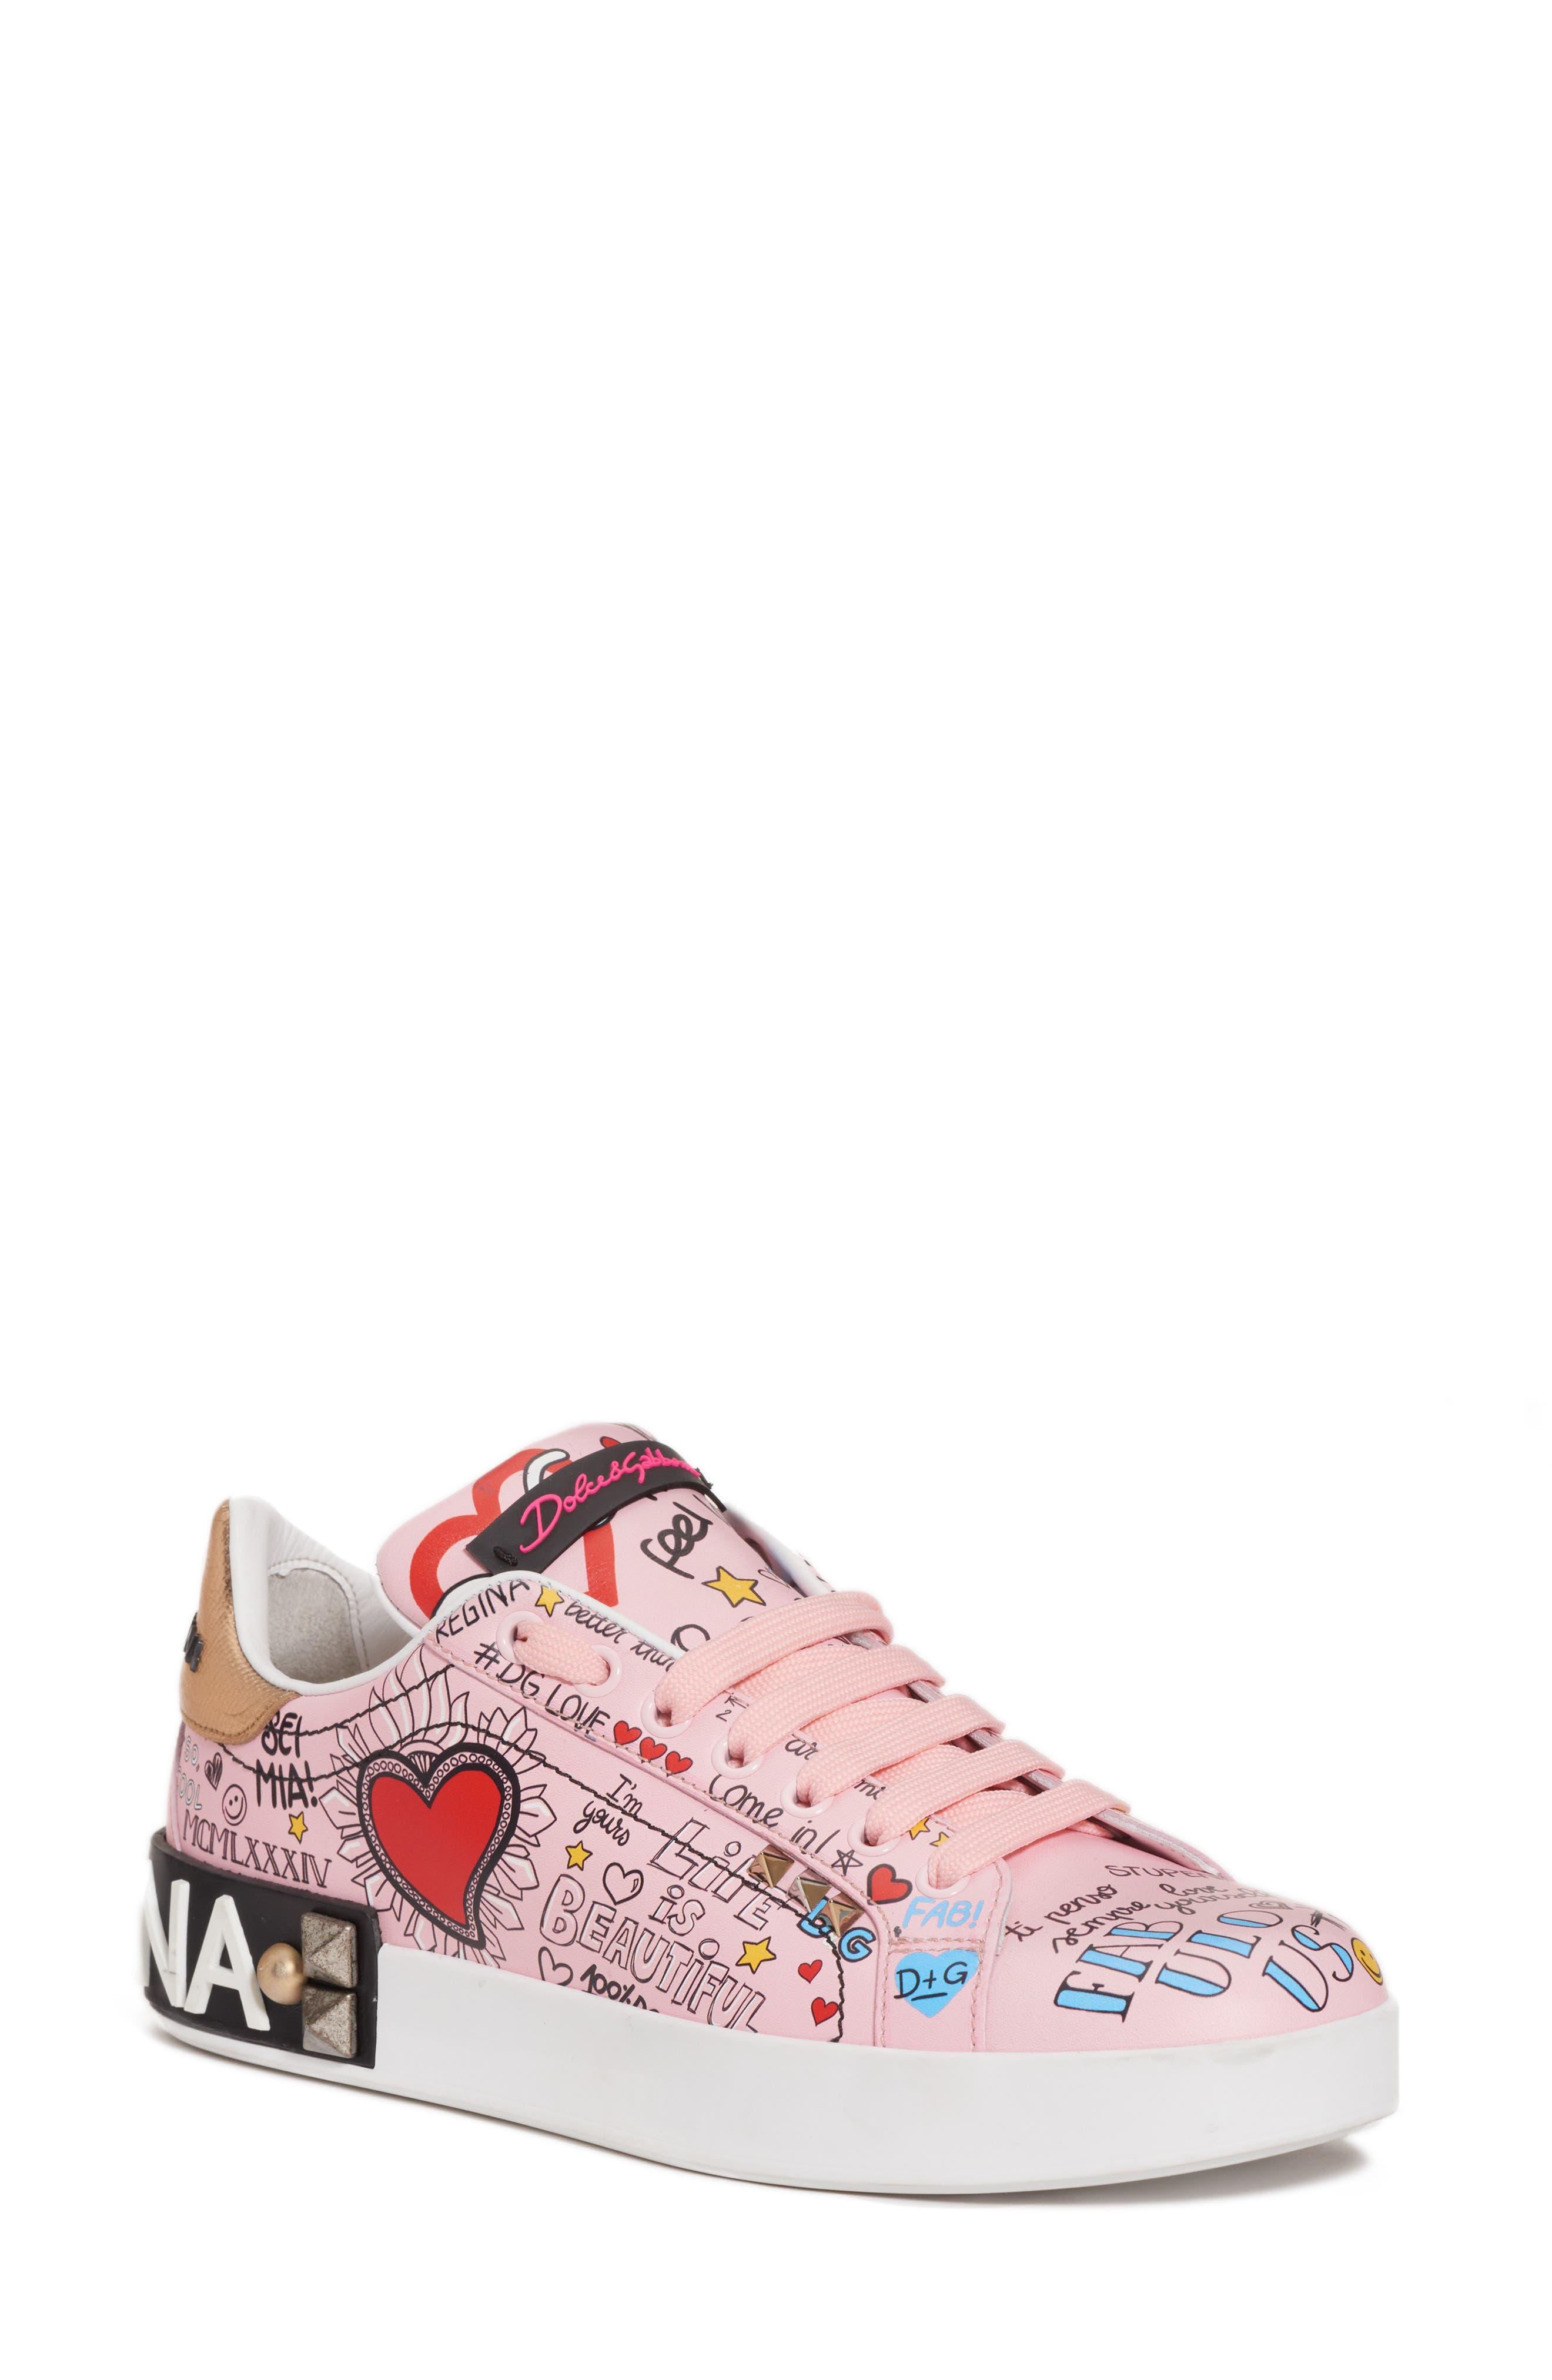 DOLCE&GABBANA Mural Graffiti Sneaker, Main, color, 690